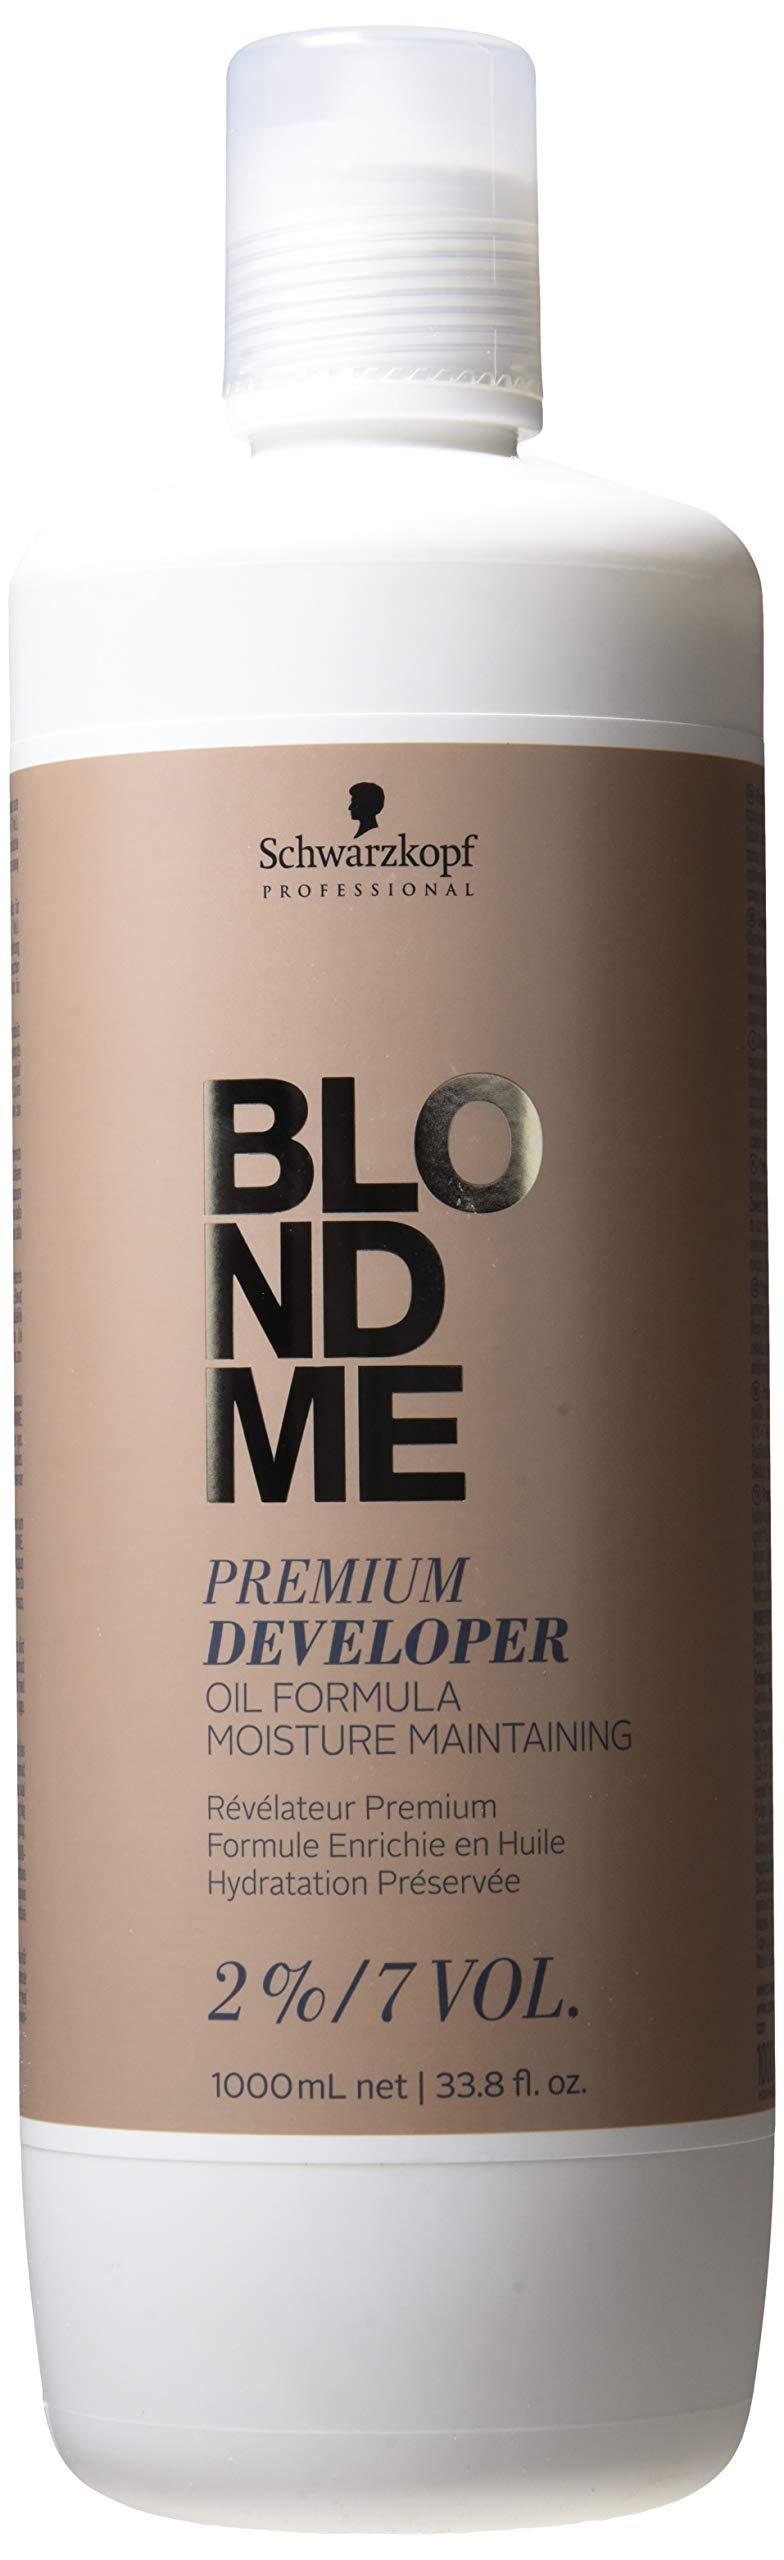 Schwarzkopfblondme Premium Developer 2% / 7 Volume Hair Color Developer, 33.8 Ounce, 1 L by Schwarzkopf